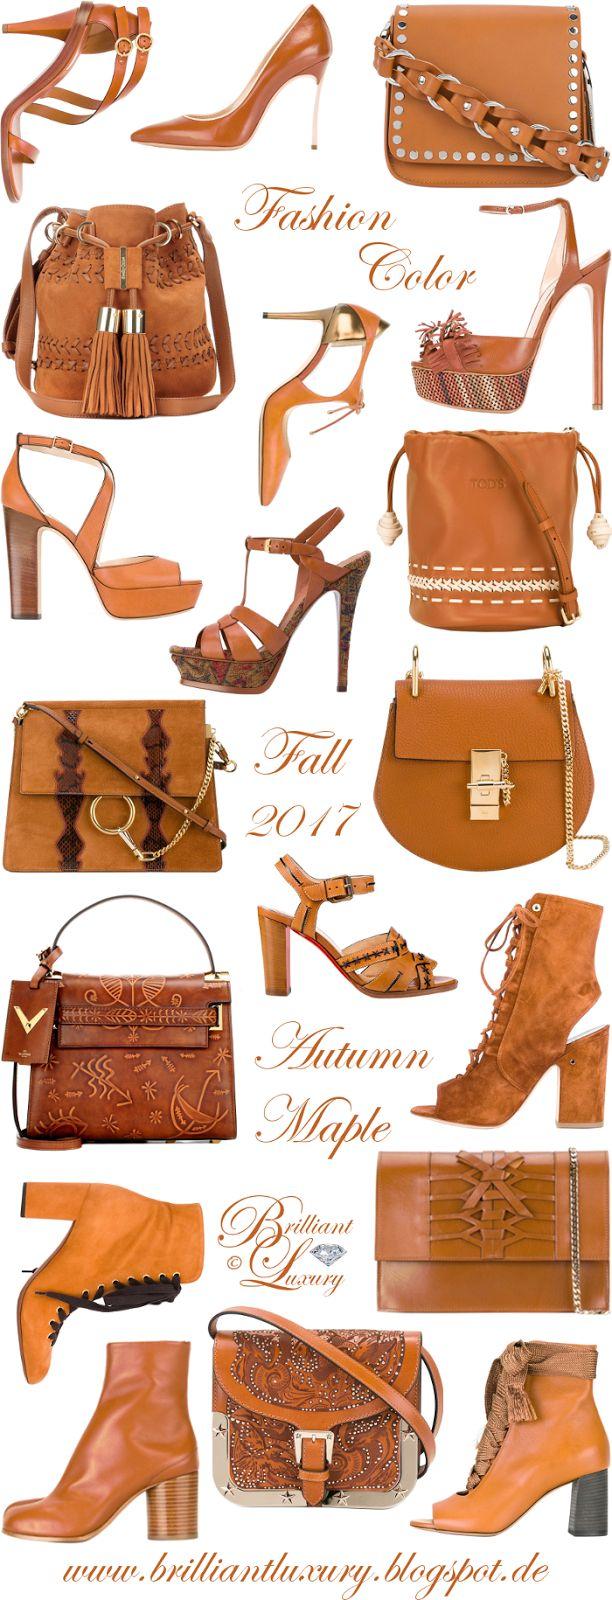 Brilliant Luxury ♦ Fashion Color Fall 2017 ~ autumn maple